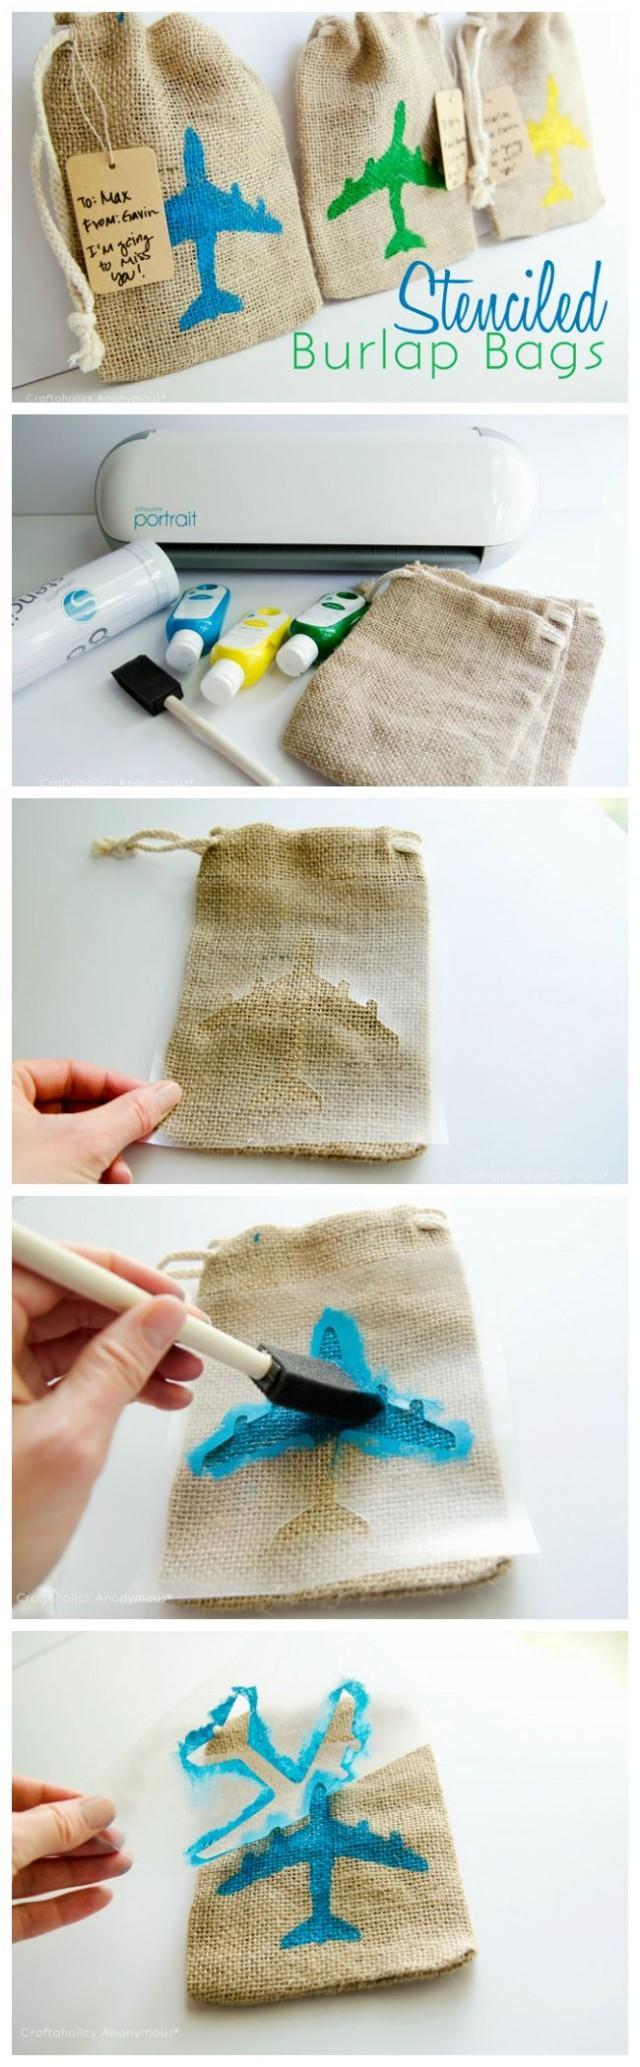 DIY - Easy Stenciled Burlap Bags #2132049 - Weddbook